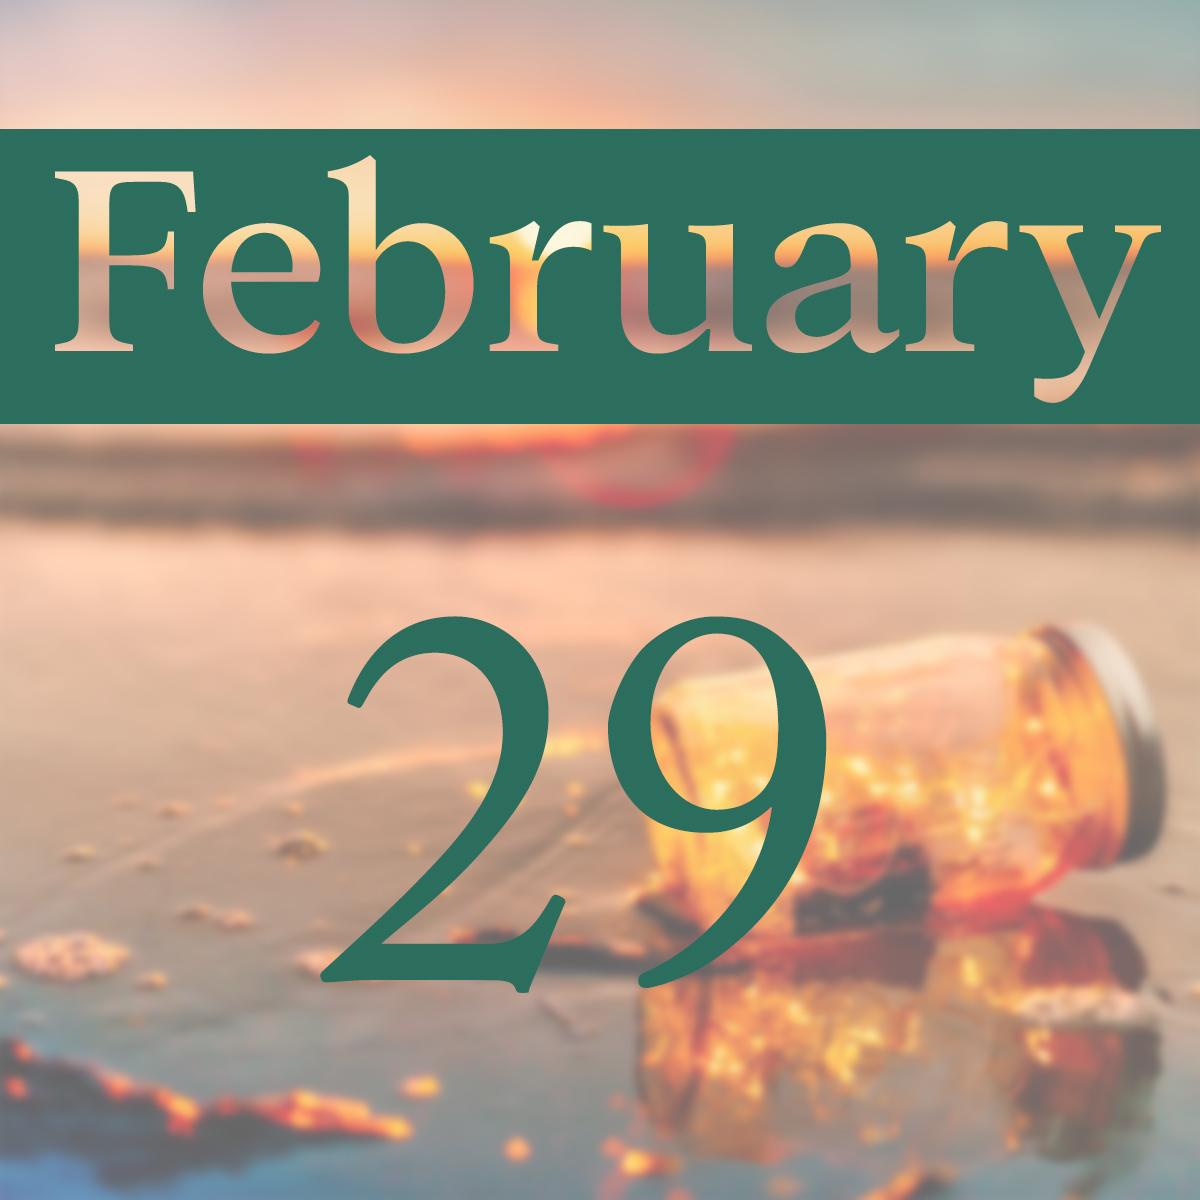 Saturday, February 29th